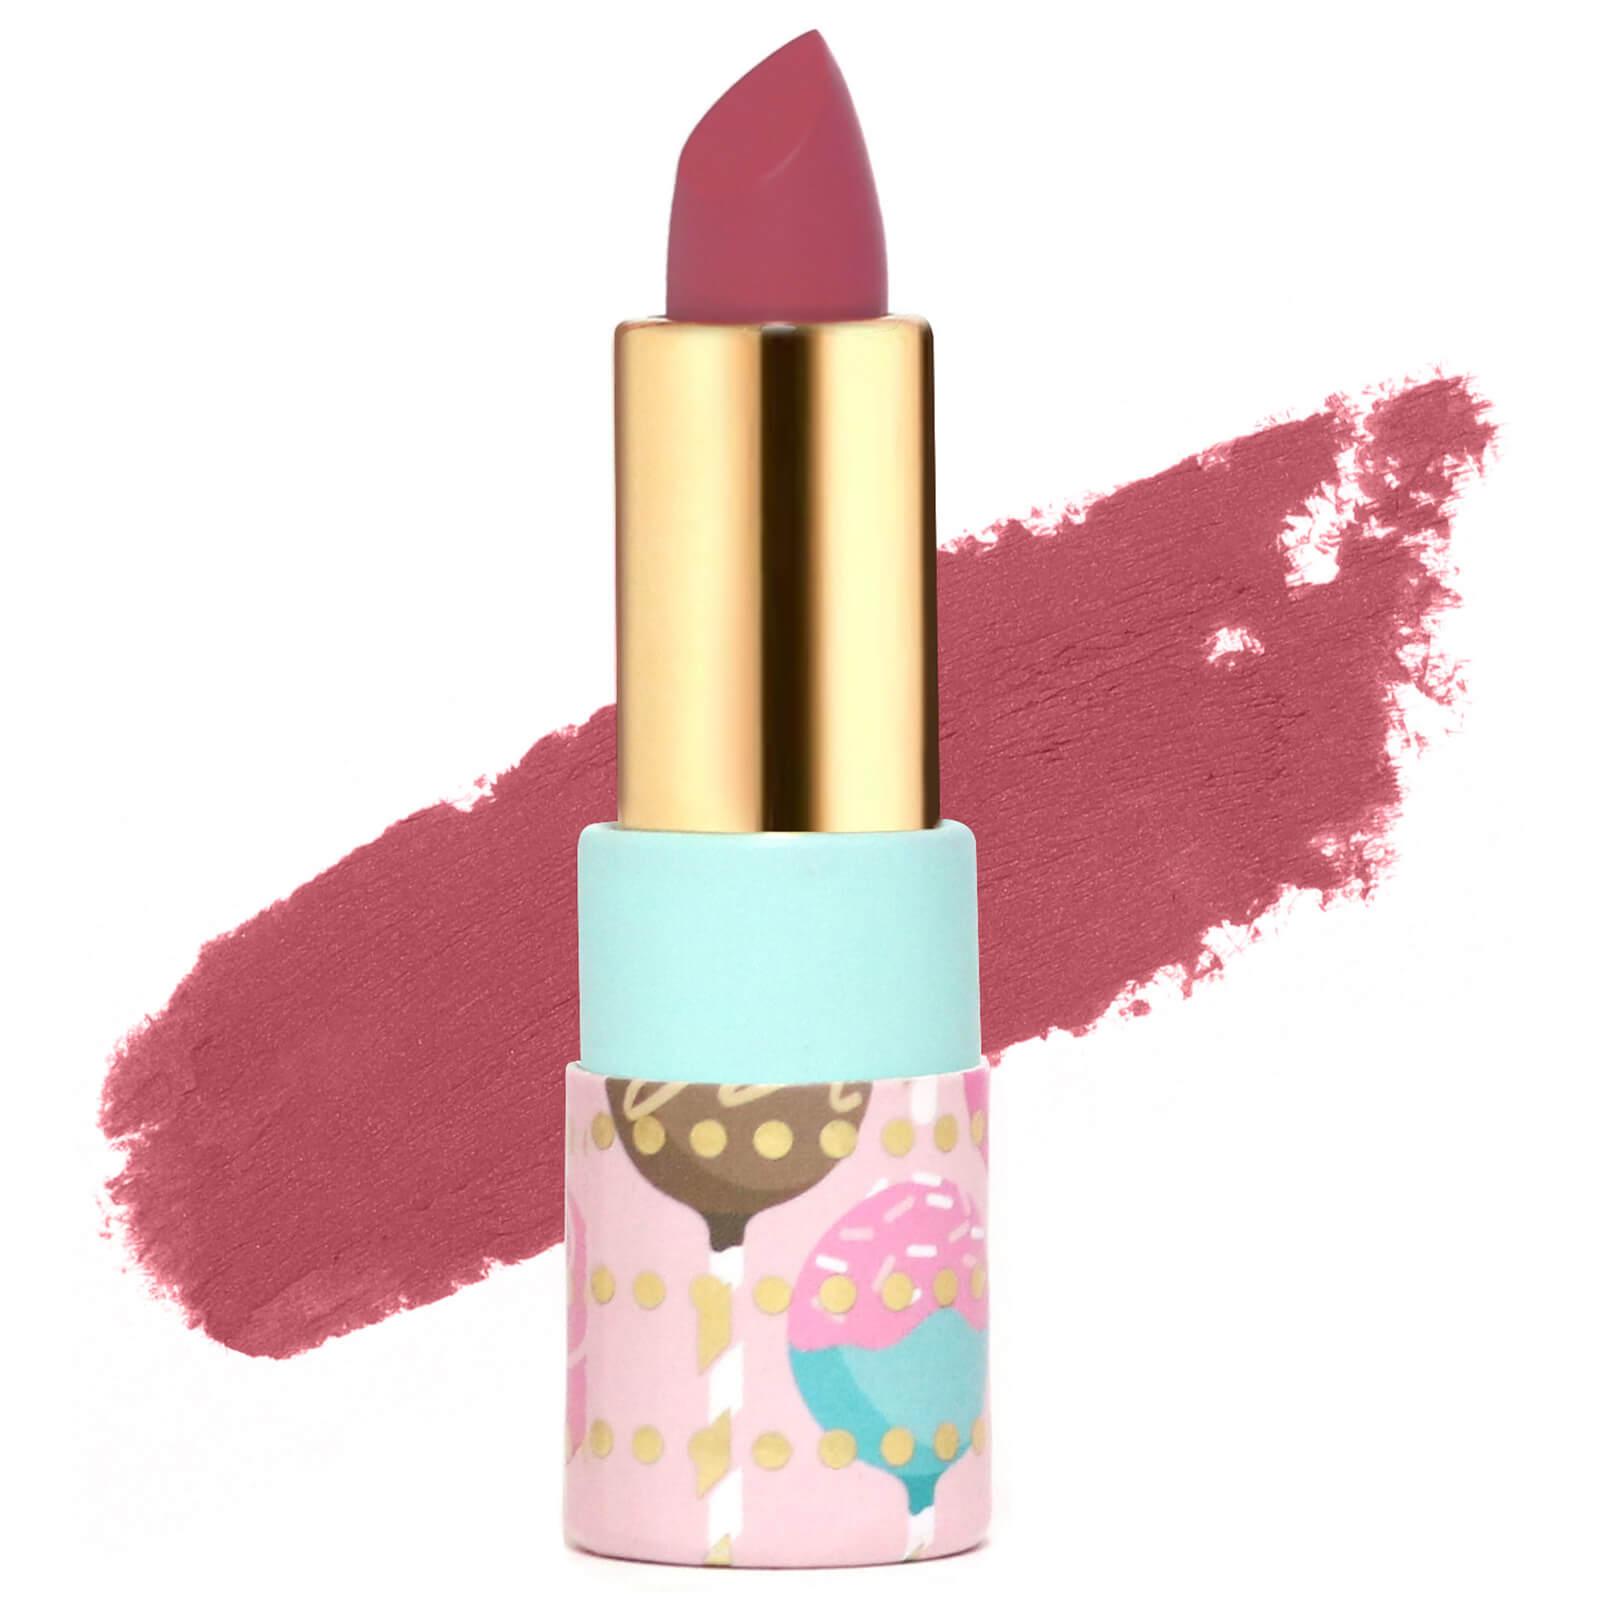 Купить Beauty Bakerie Cake Pop Lippies 0.05oz (Various Shades) - Sonrisa Souffle